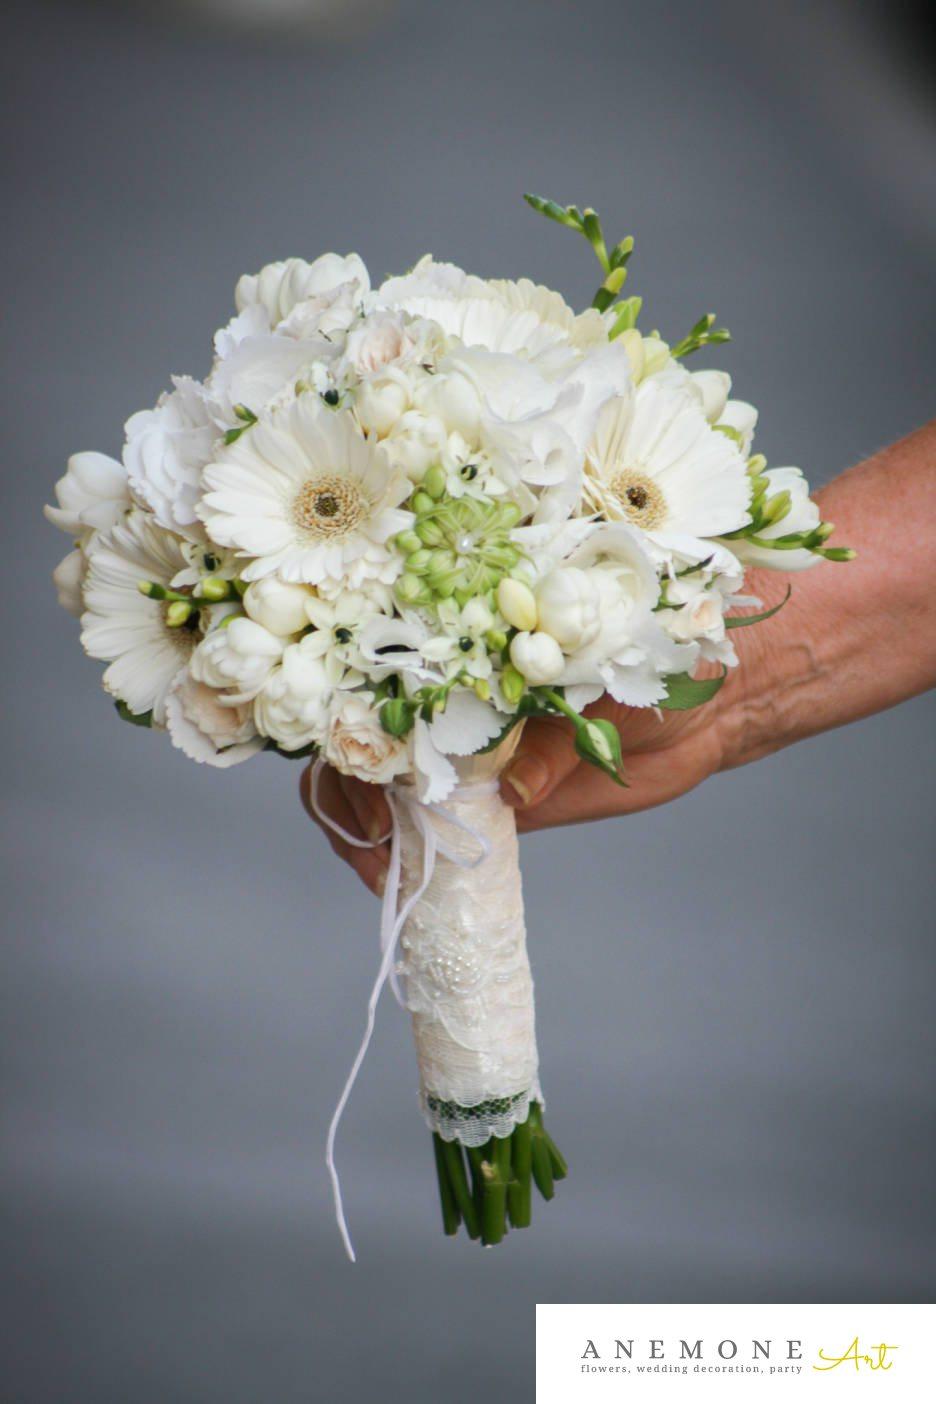 Poza, foto cu Flori de nunta buchet mireasa, frezii, lisianthus, maner buchet in Arad, Timisoara, Oradea (wedding flowers, bouquets) nunta Arad, Timisoara, Oradea